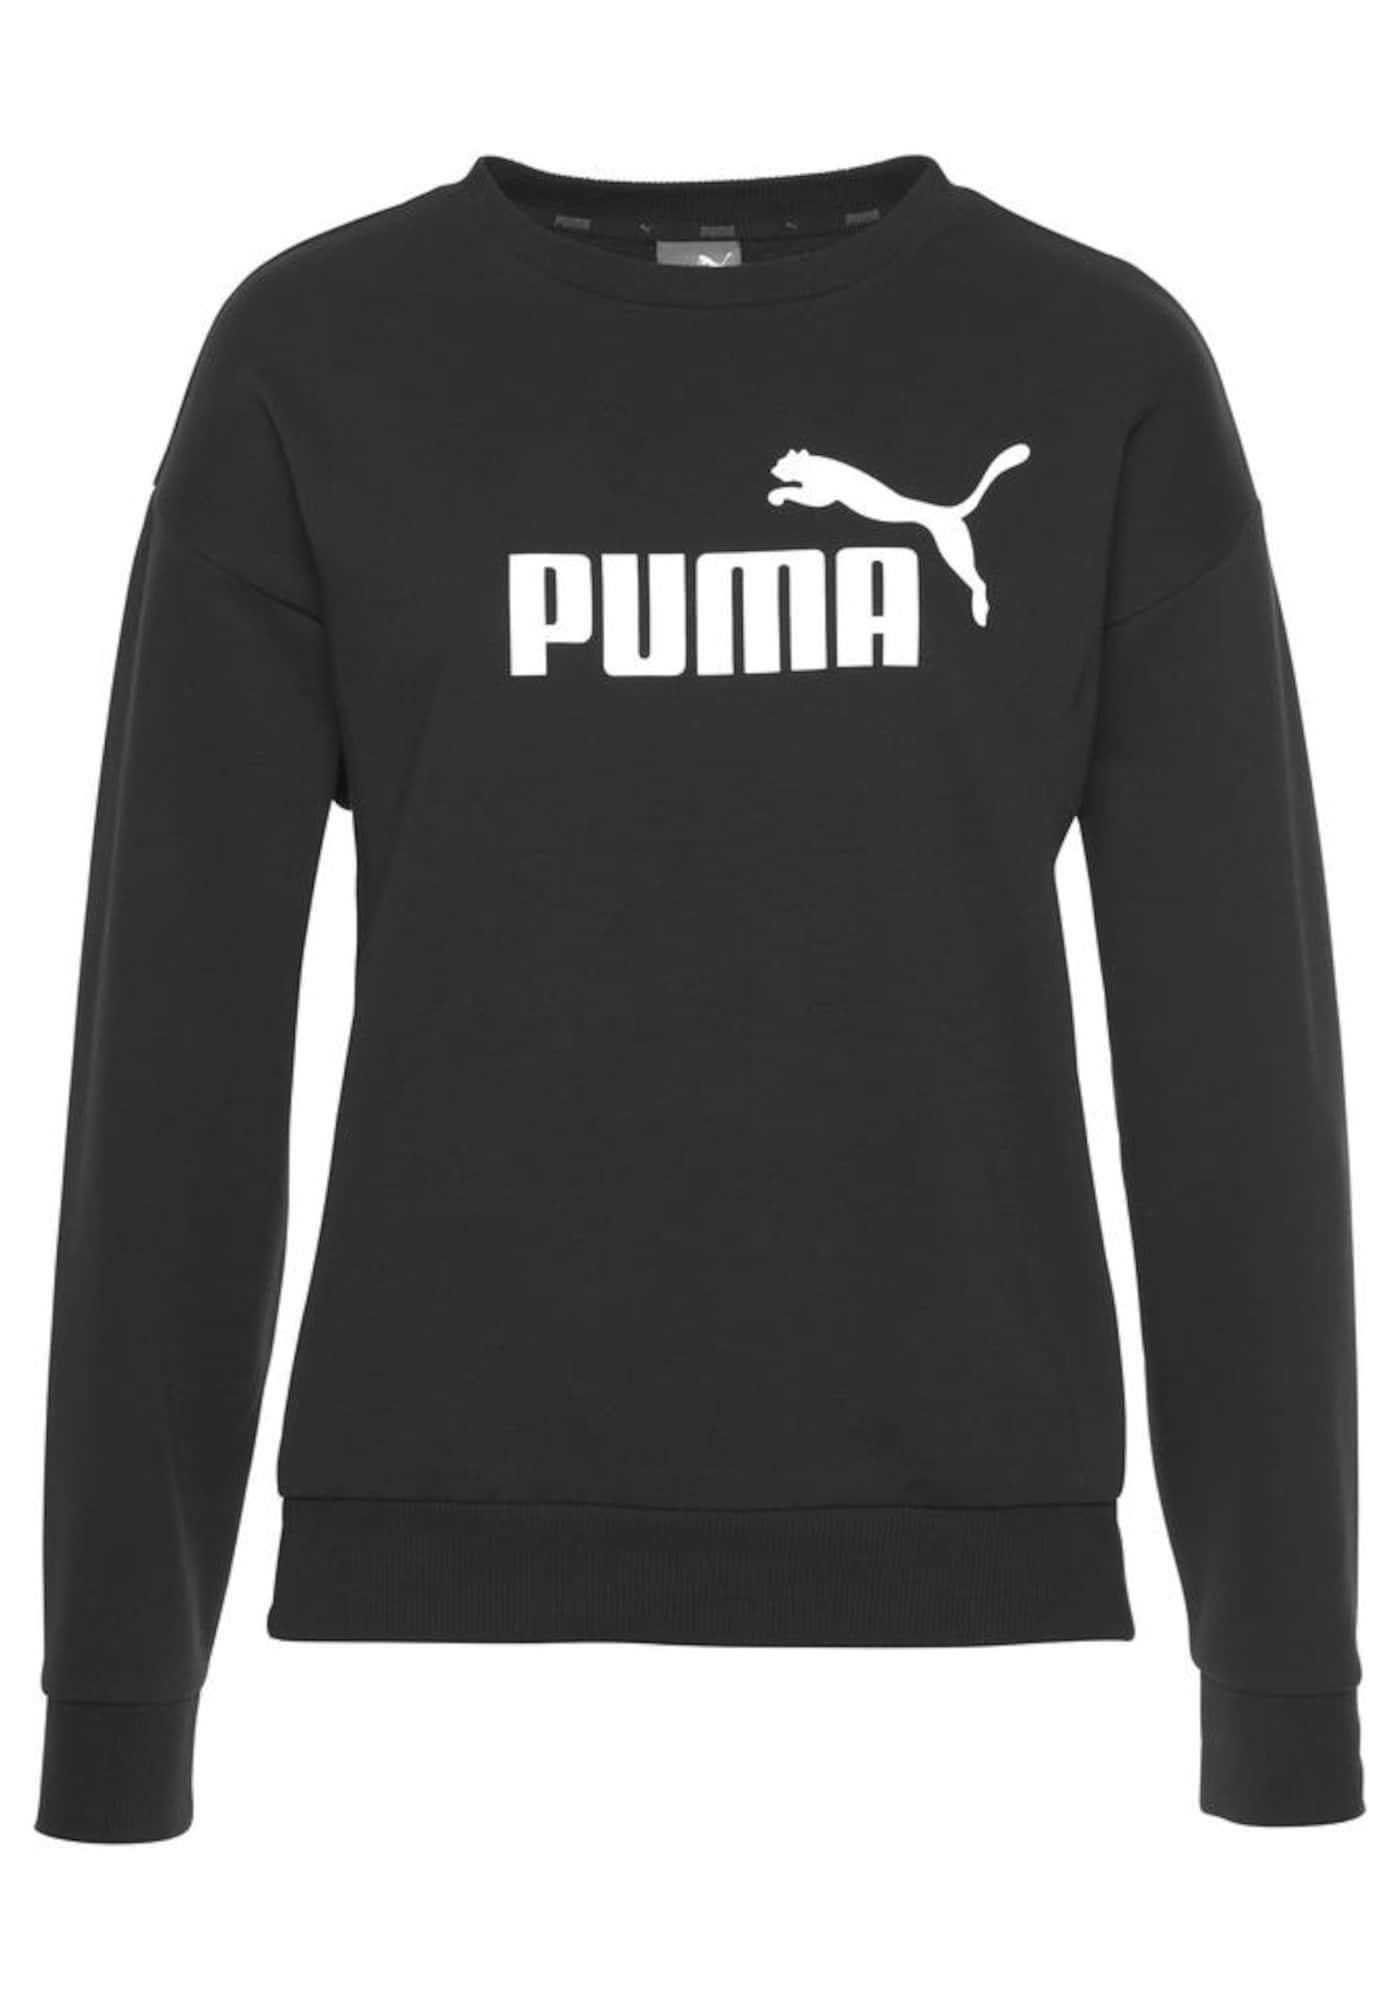 PUMA Sportinio tipo megztinis 'Essentials' balta / juoda